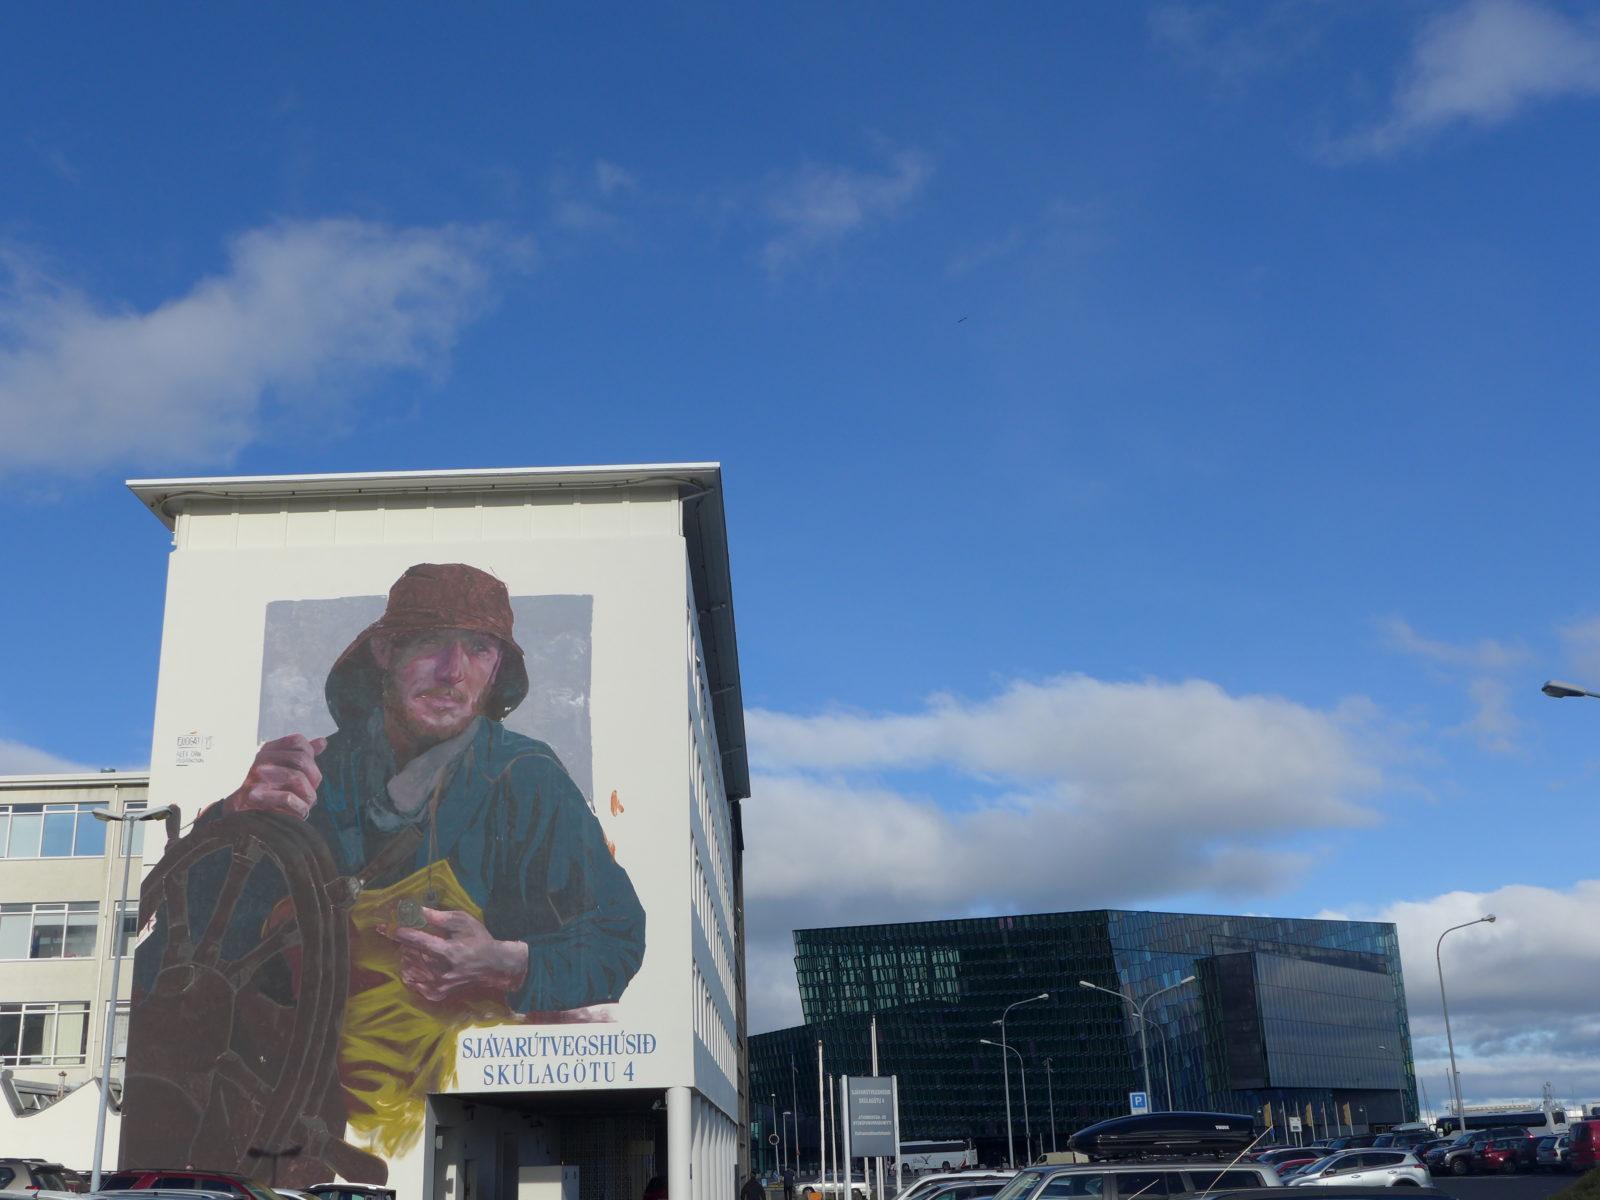 evoca1 saunstarr marin street art reykavik islande port wall poetry - Focus sur Reykjavik : la capitale de l'Islande s'ouvre au street art !